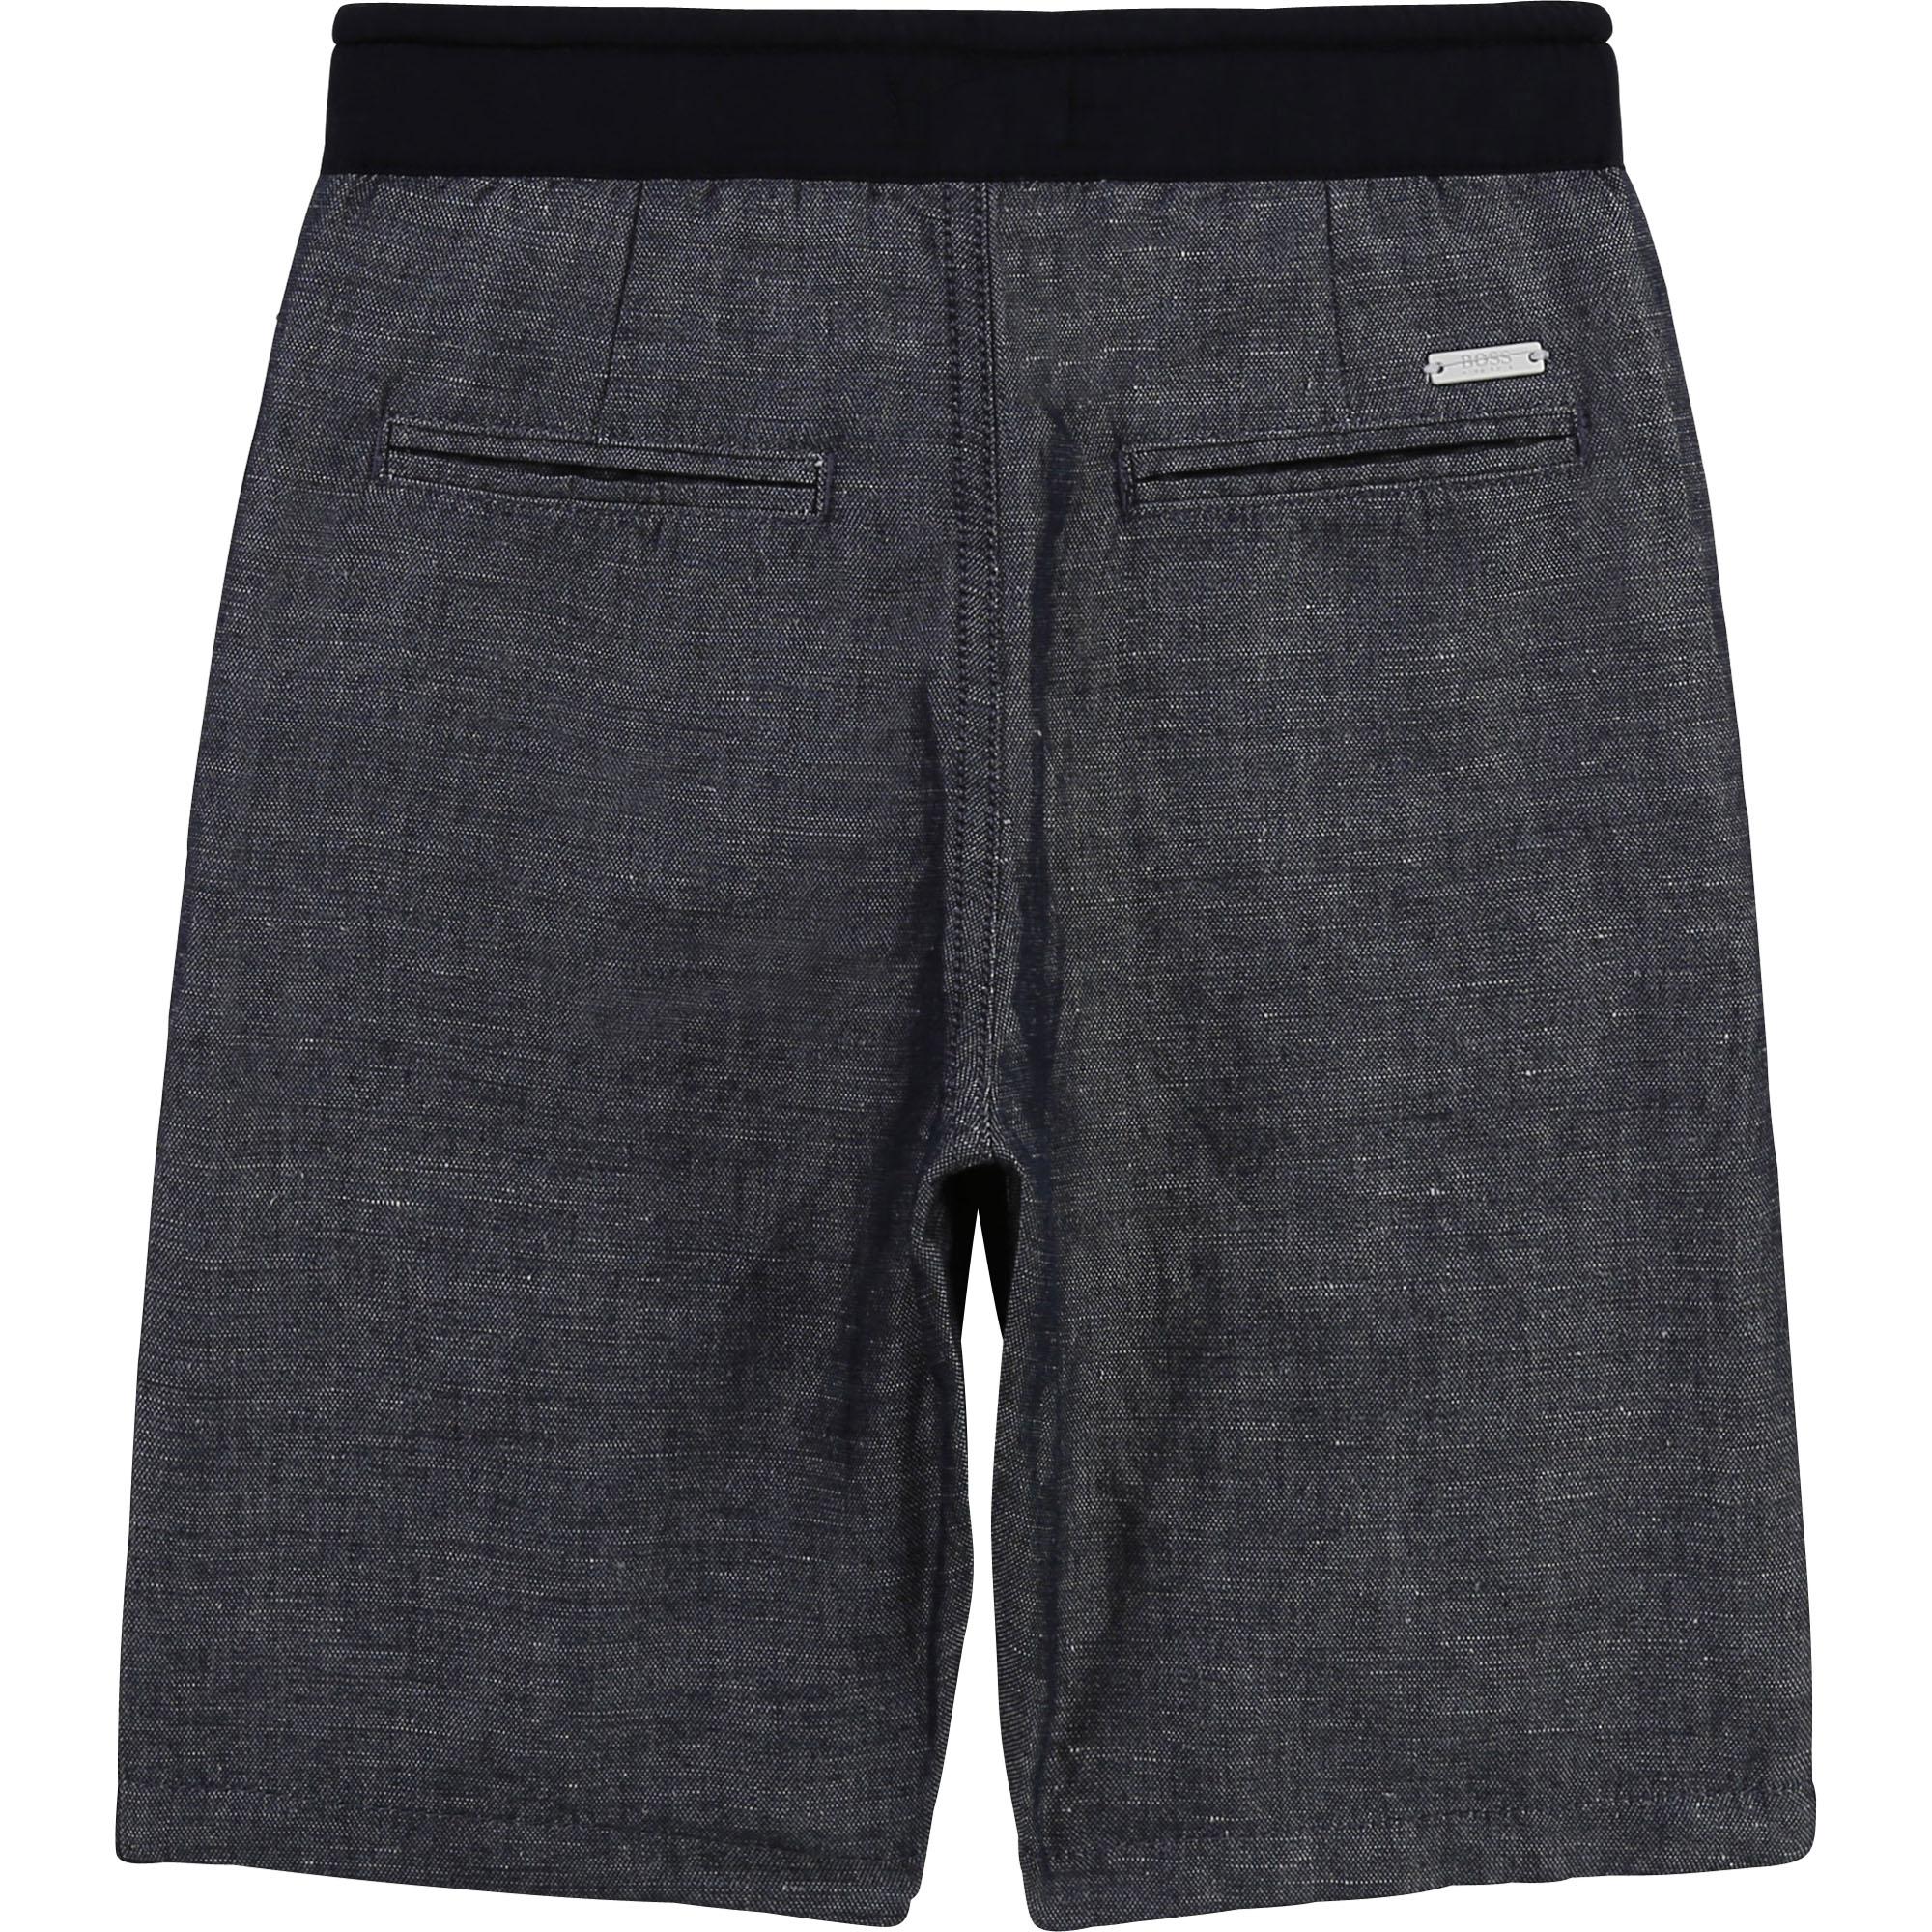 Linen and cotton bermuda shorts BOSS for BOY